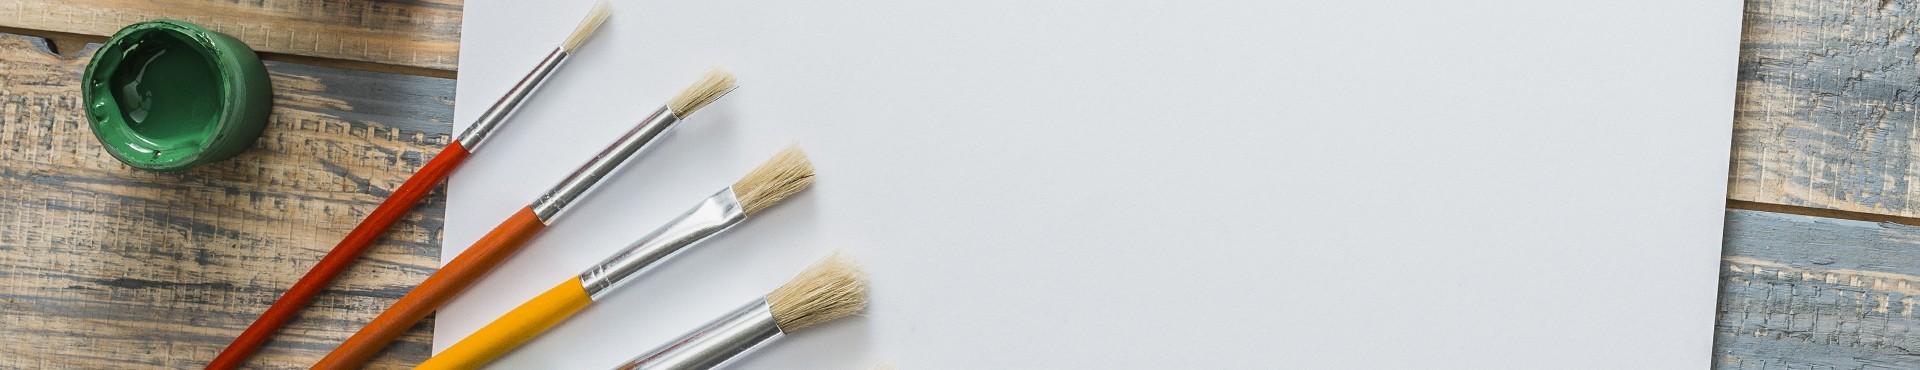 Pinceles de Oleo/Acrilico